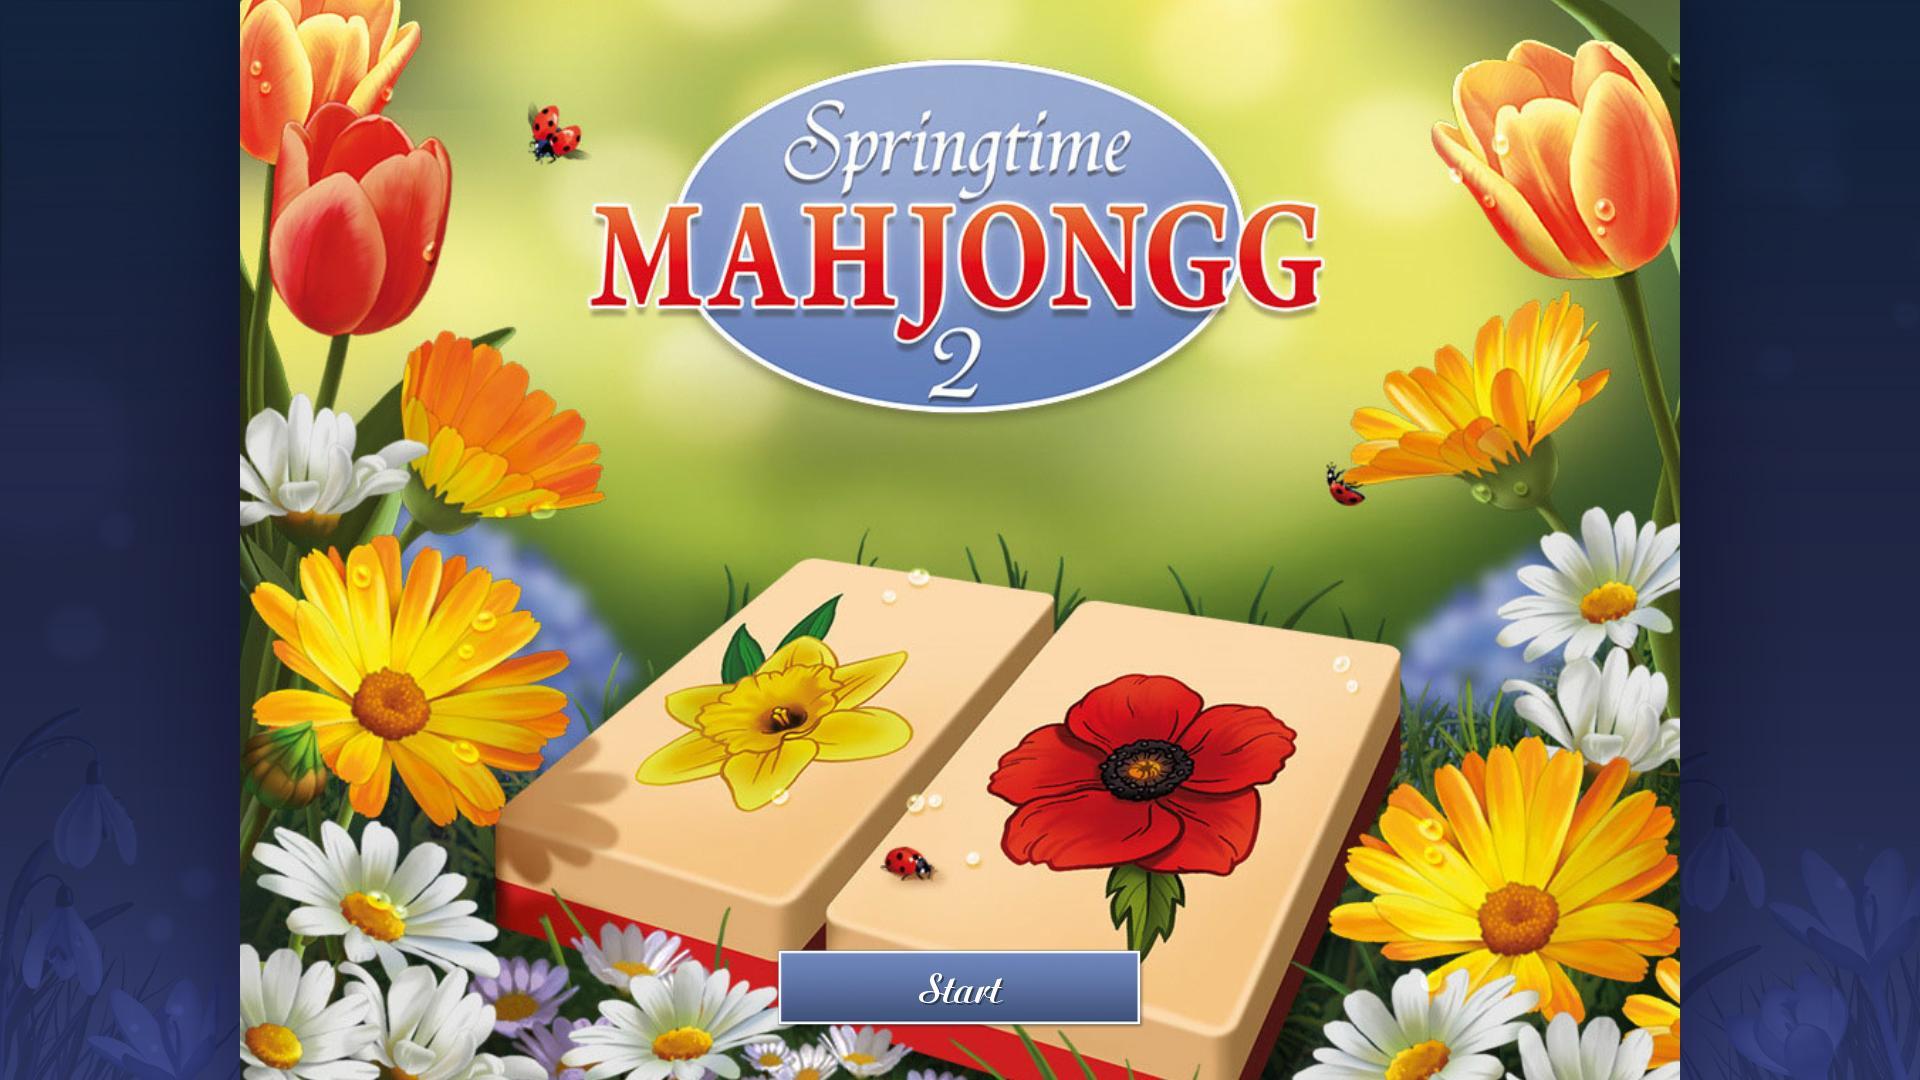 Весенний Маджонг 2 | Springtime Mahjongg 2 (En)